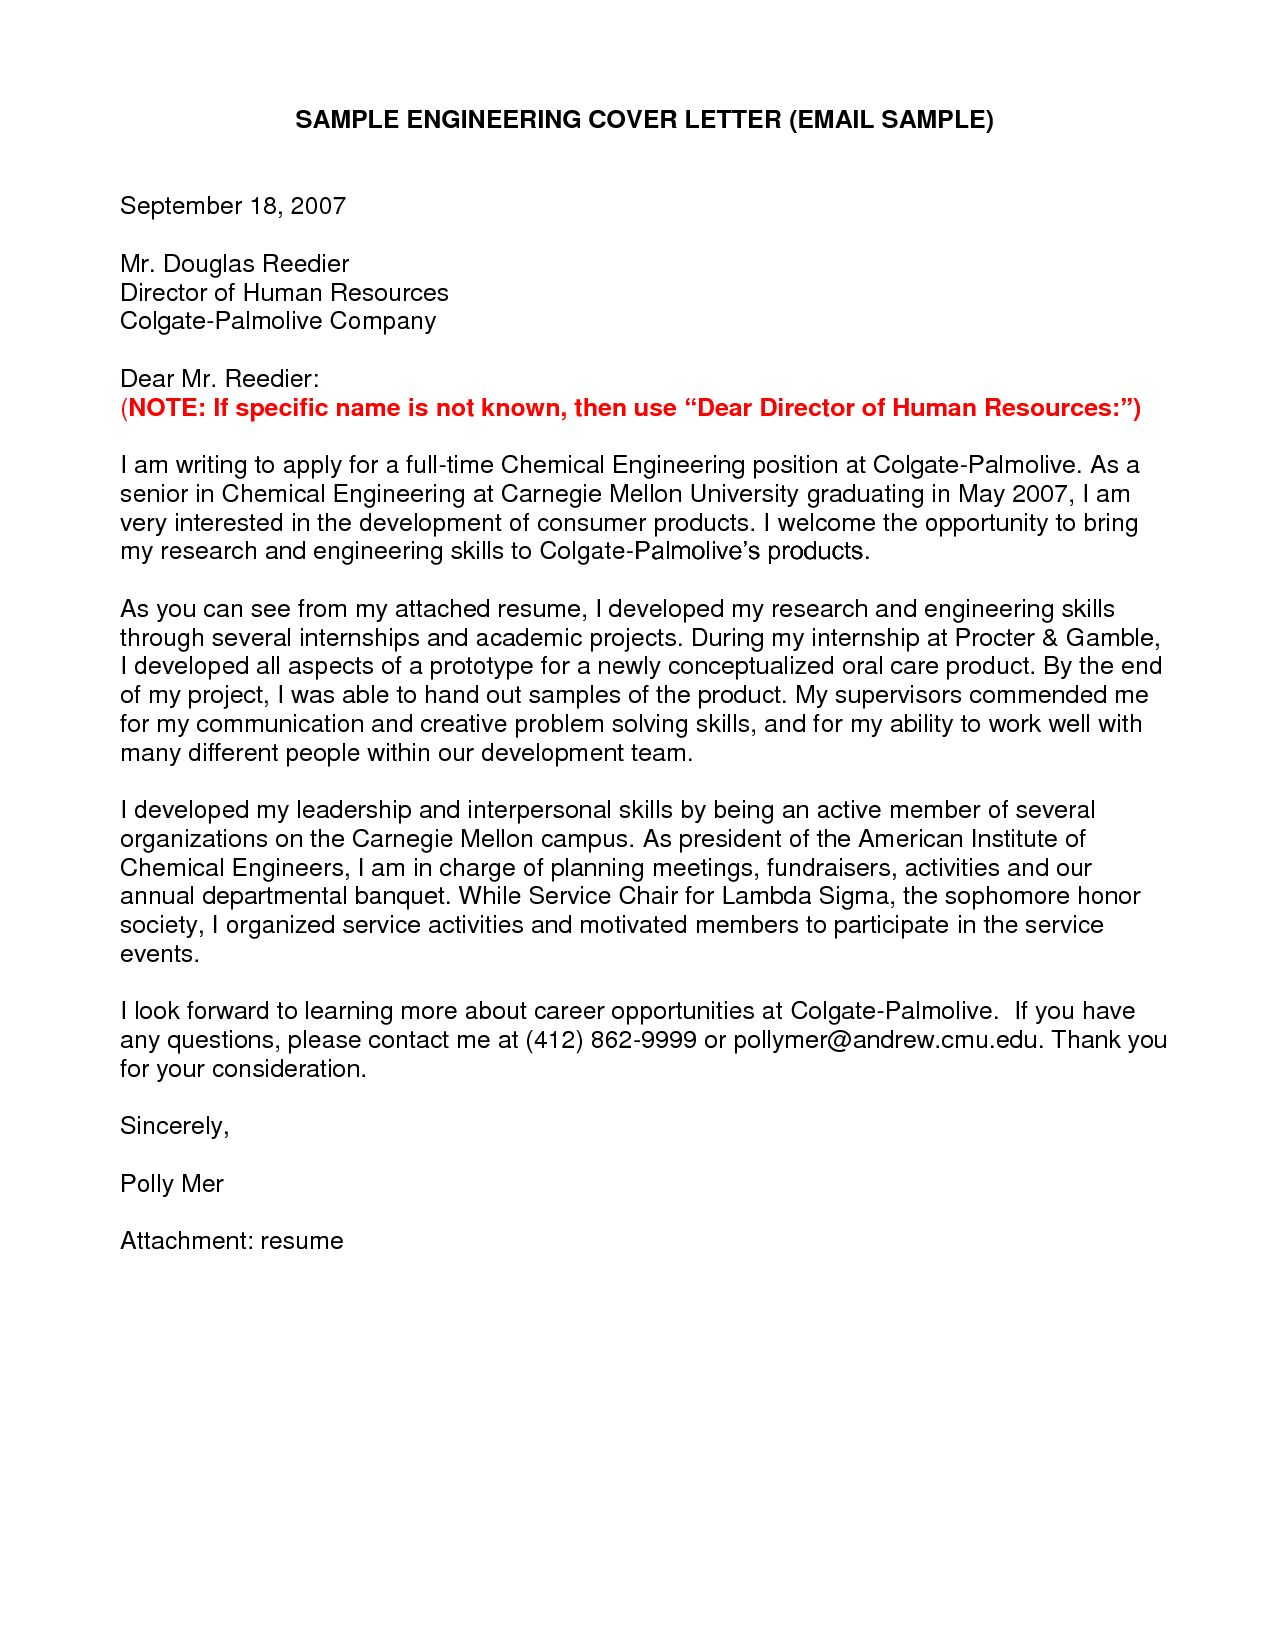 25 Engineering Cover Letter  Engineering Cover Letter